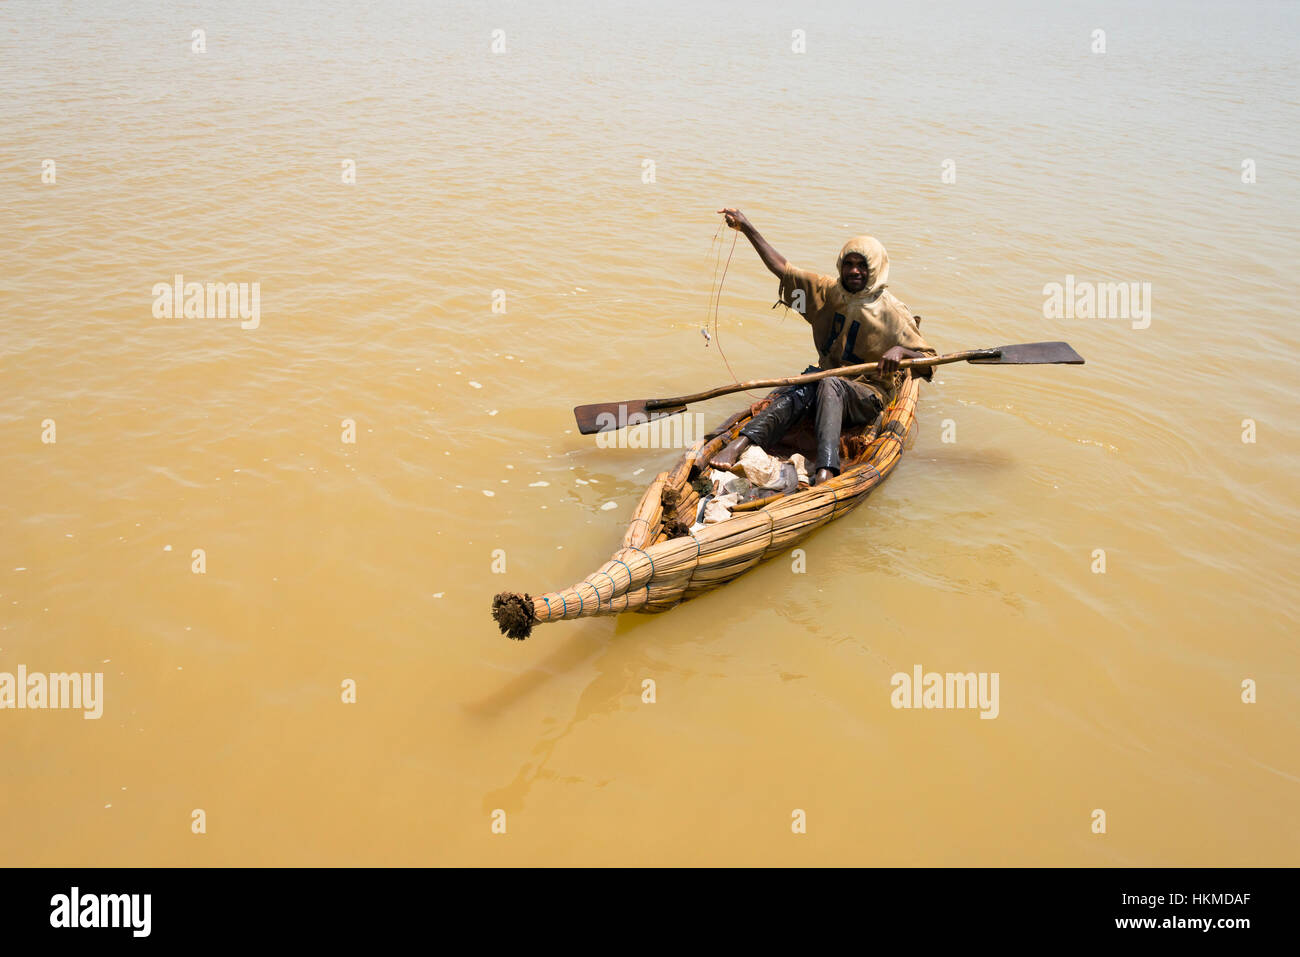 Fisherman on canoe made of papyrus plant, Lake Tana, Bahir Dar, Ethiopia - Stock Image